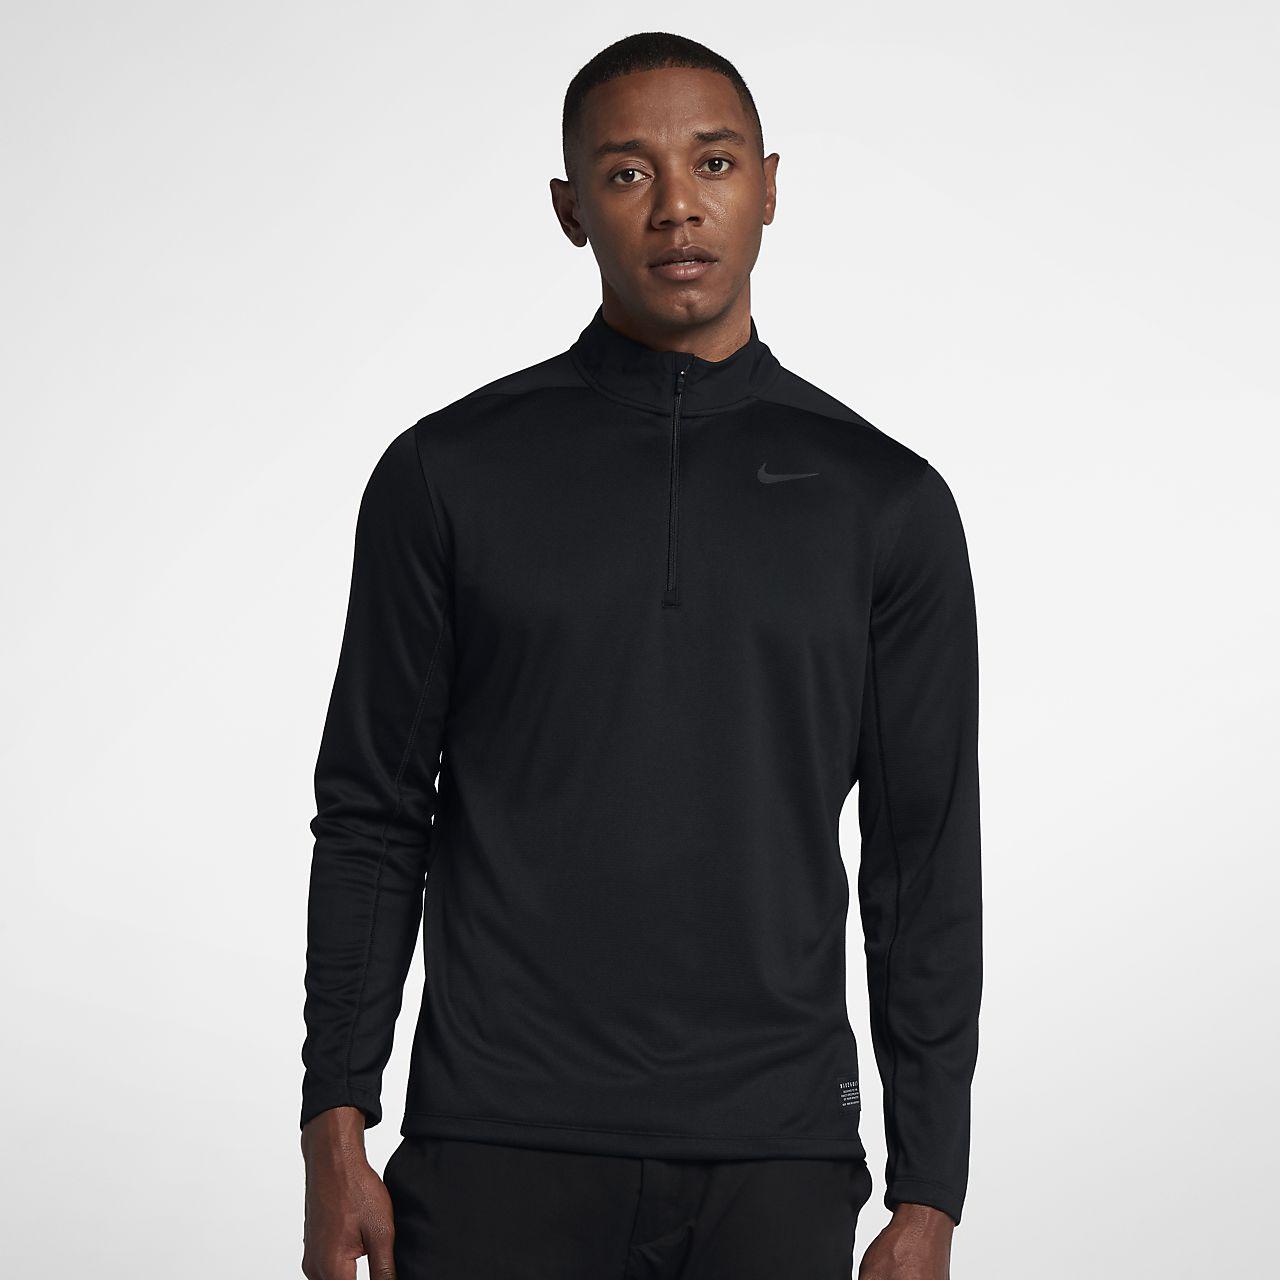 d4e13ece7 Nike Dri-FIT Men's 1/2-Zip Golf Top. Nike.com